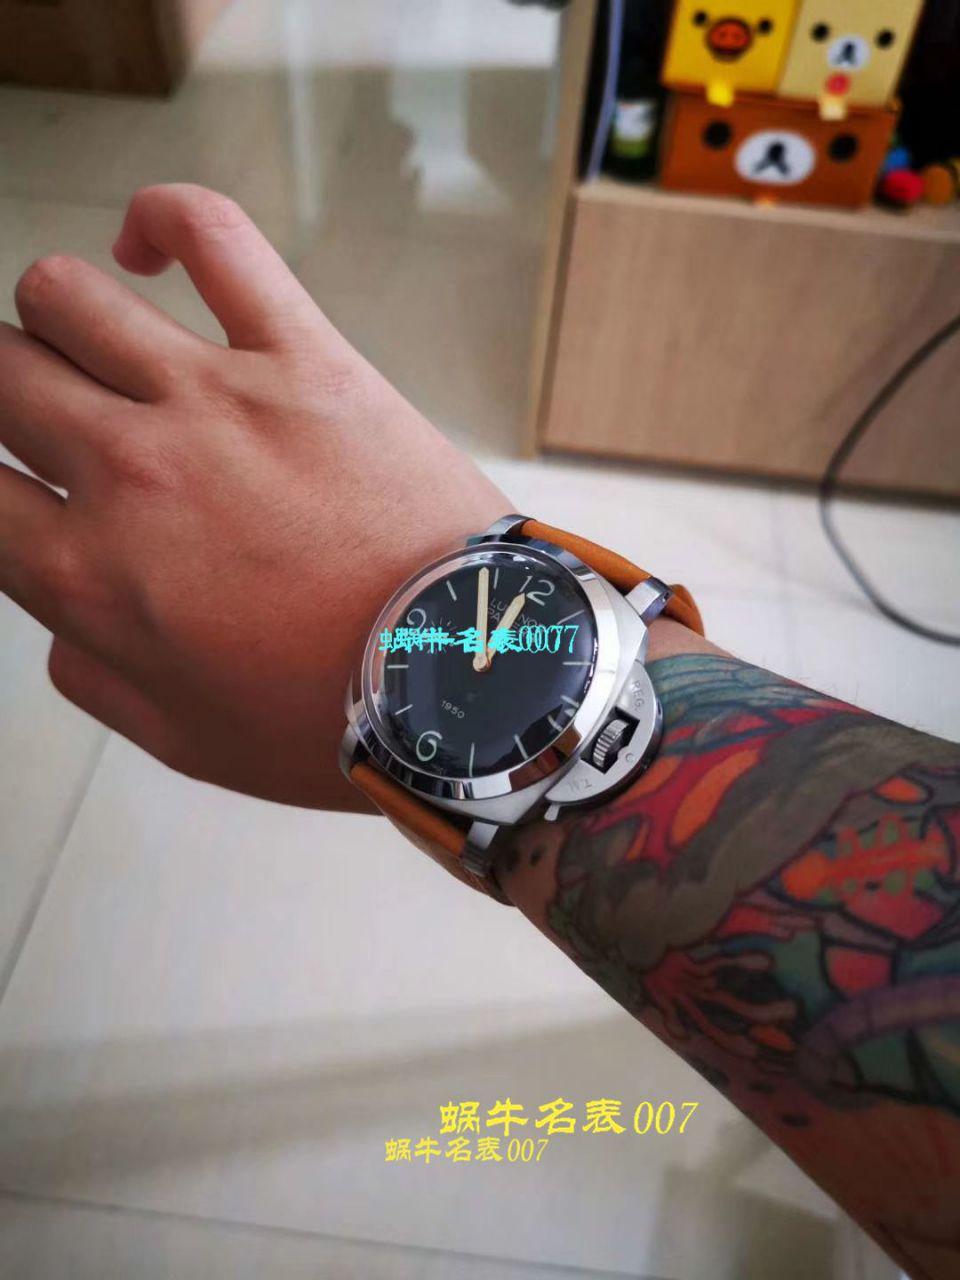 【V9一比一顶级复刻手表】沛纳海LUMINOR系列 PAM00972雕花腕表